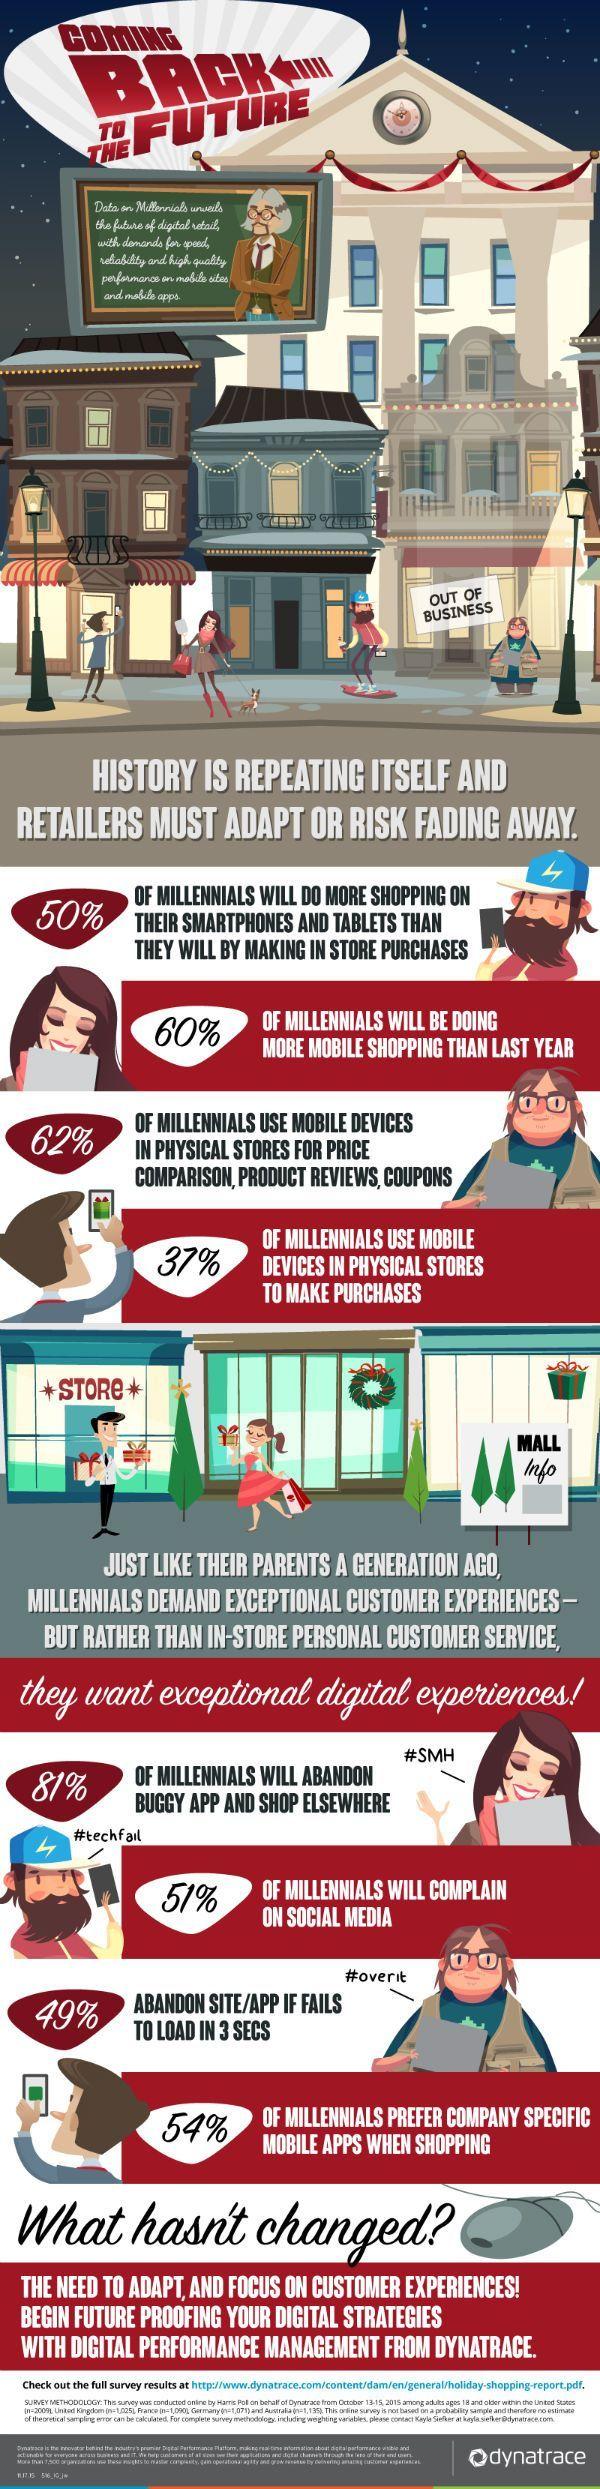 comercio_móvil_millennials_infografía